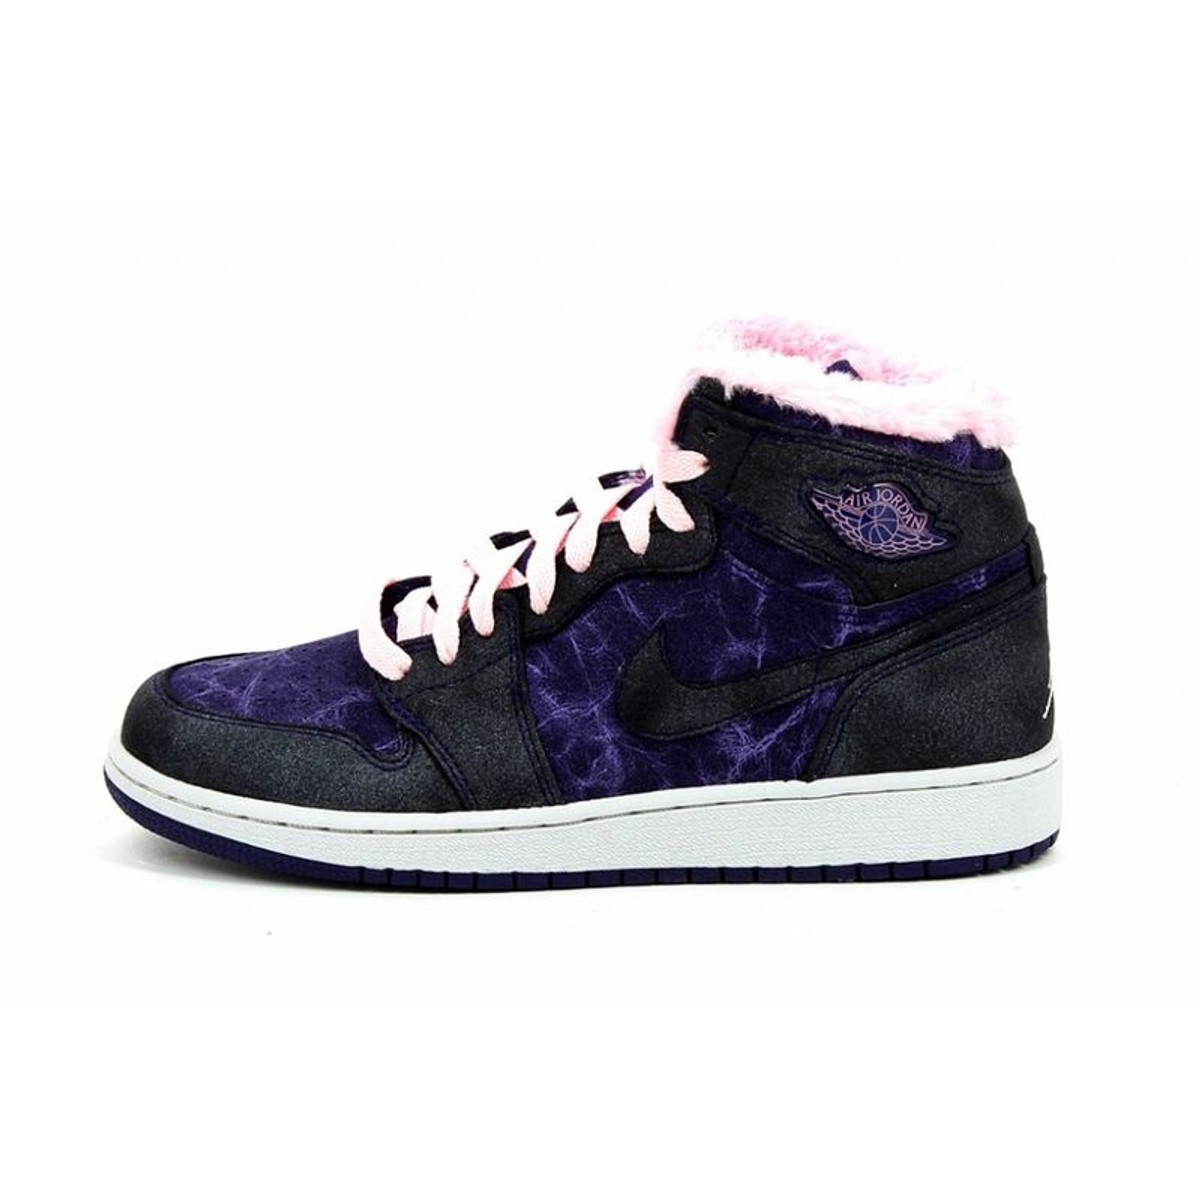 meilleur site web 6d607 b991a Basket Nike Air Jordan 1 Retro (gs) - 535804-509 - Taille ...